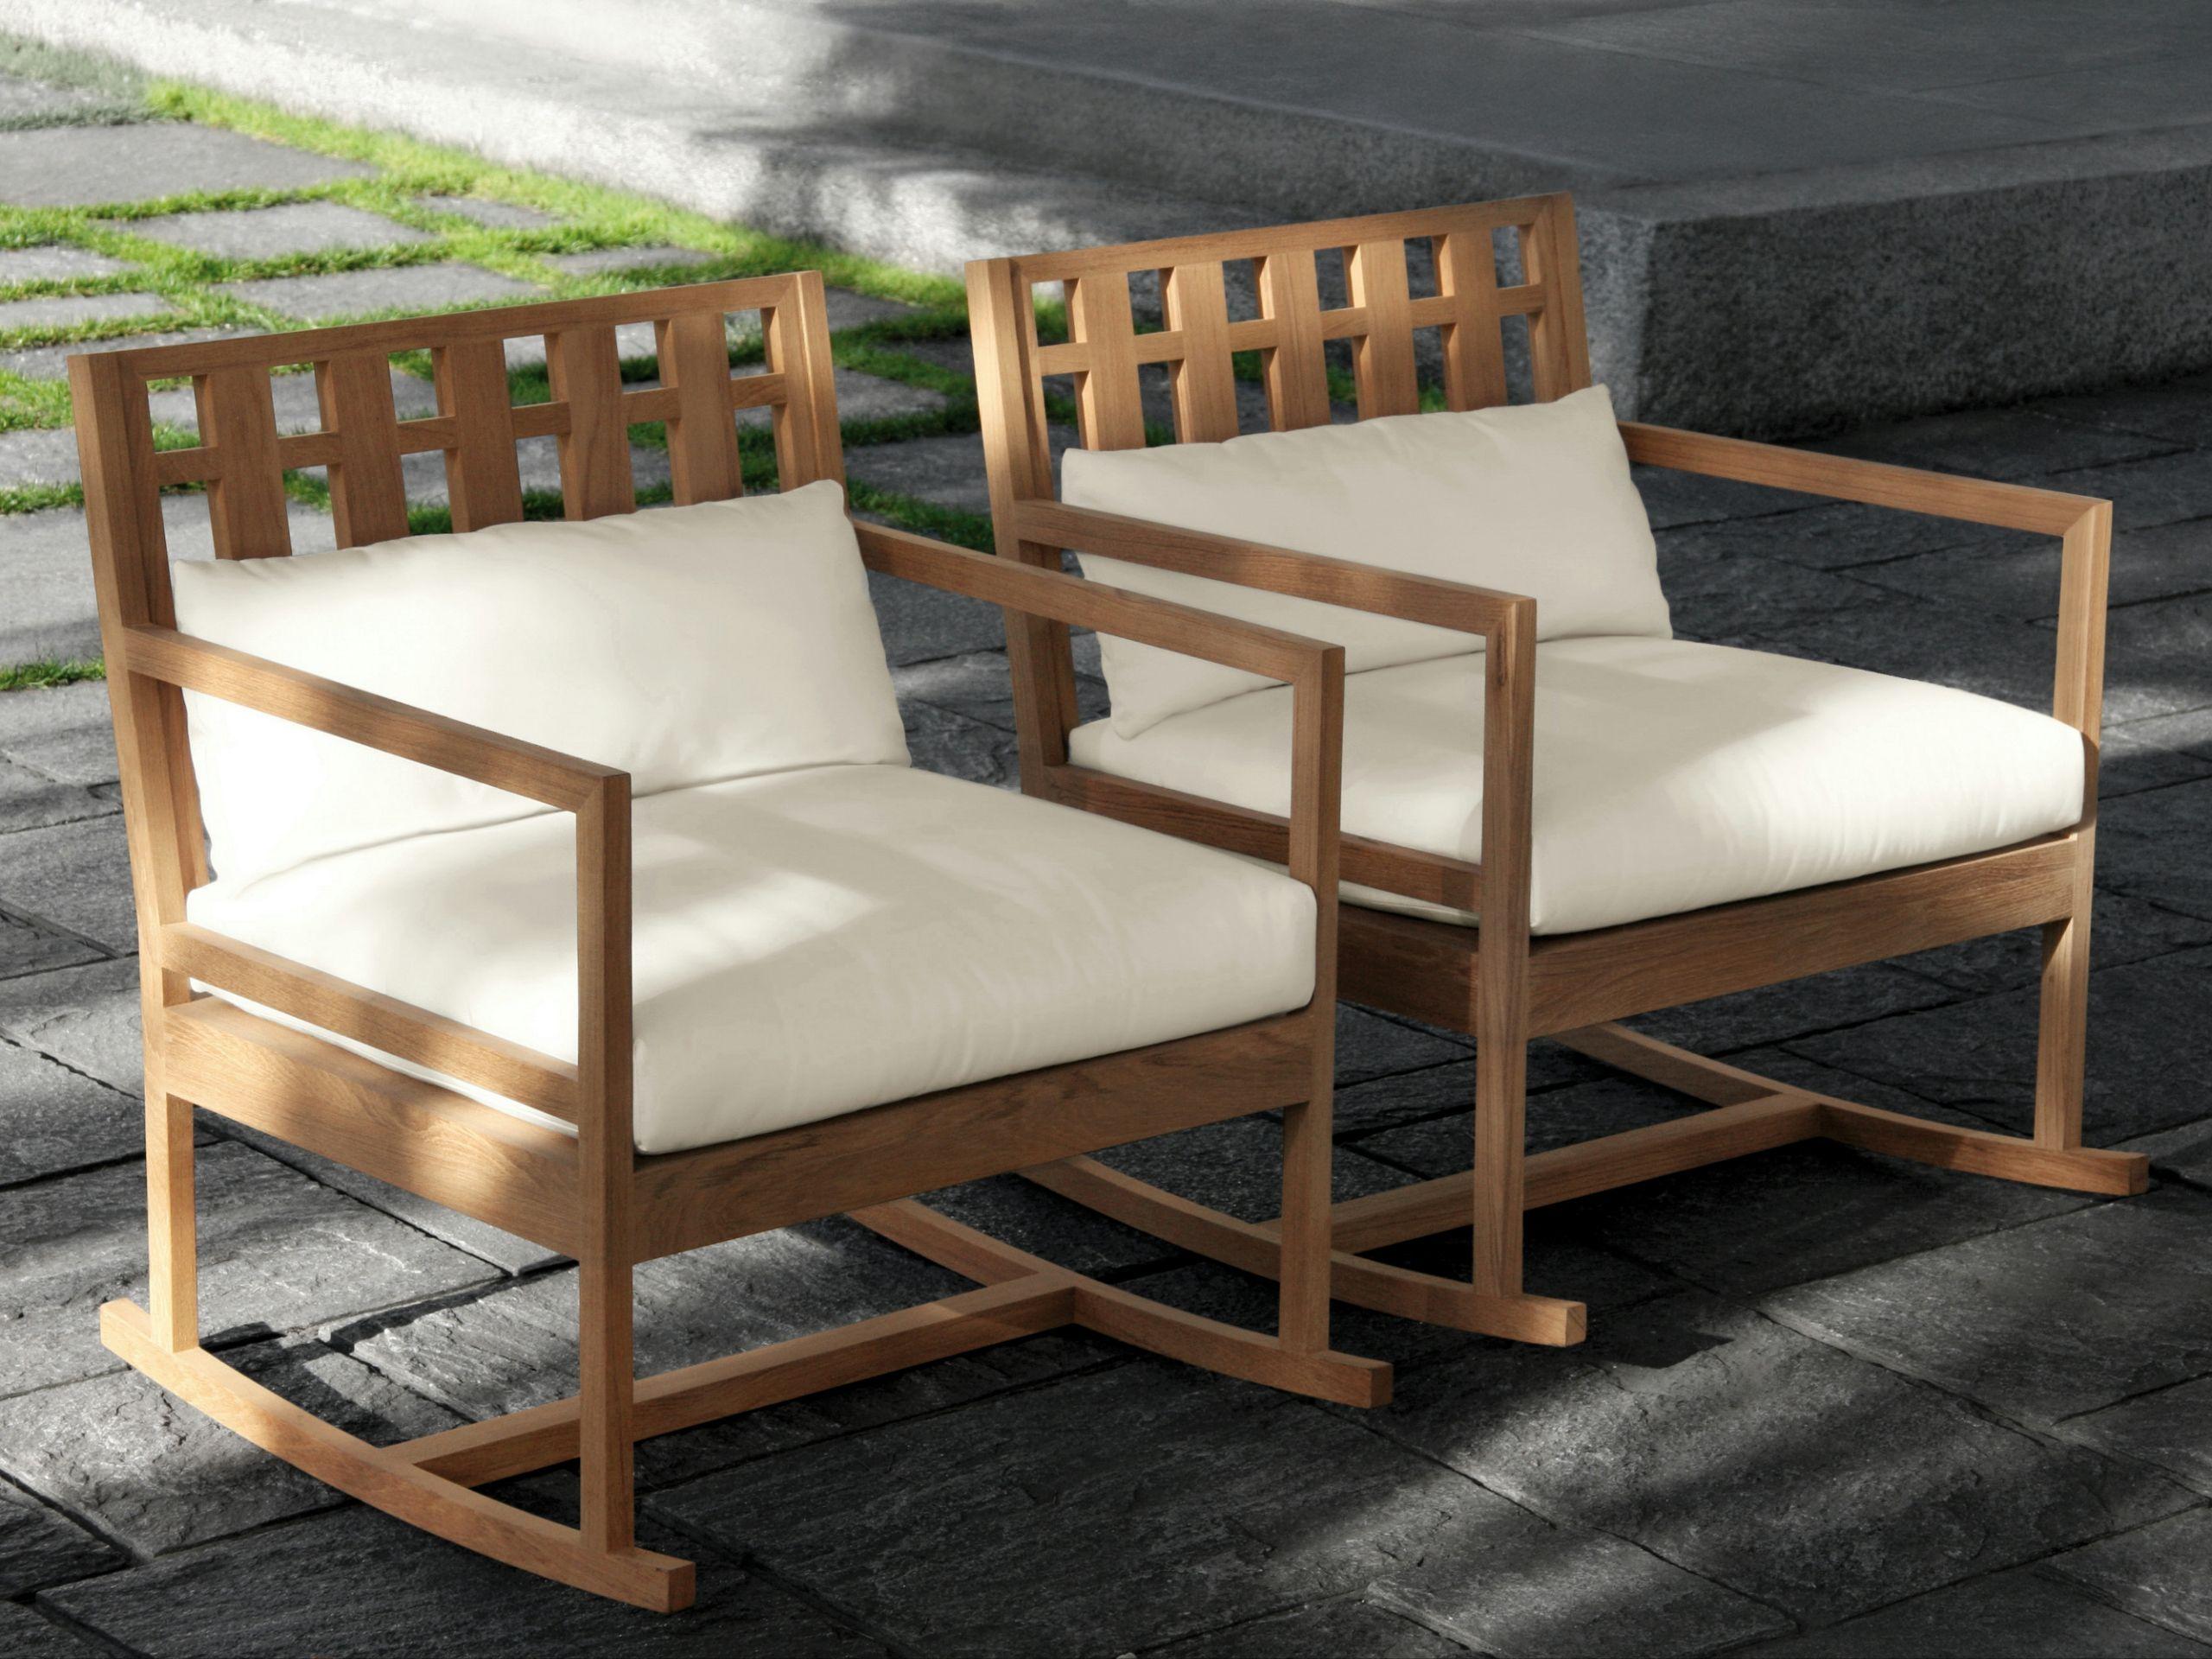 Mecedora De Teca Google Search Outdoor Furniture Pinterest  # Muebles Teca Interior